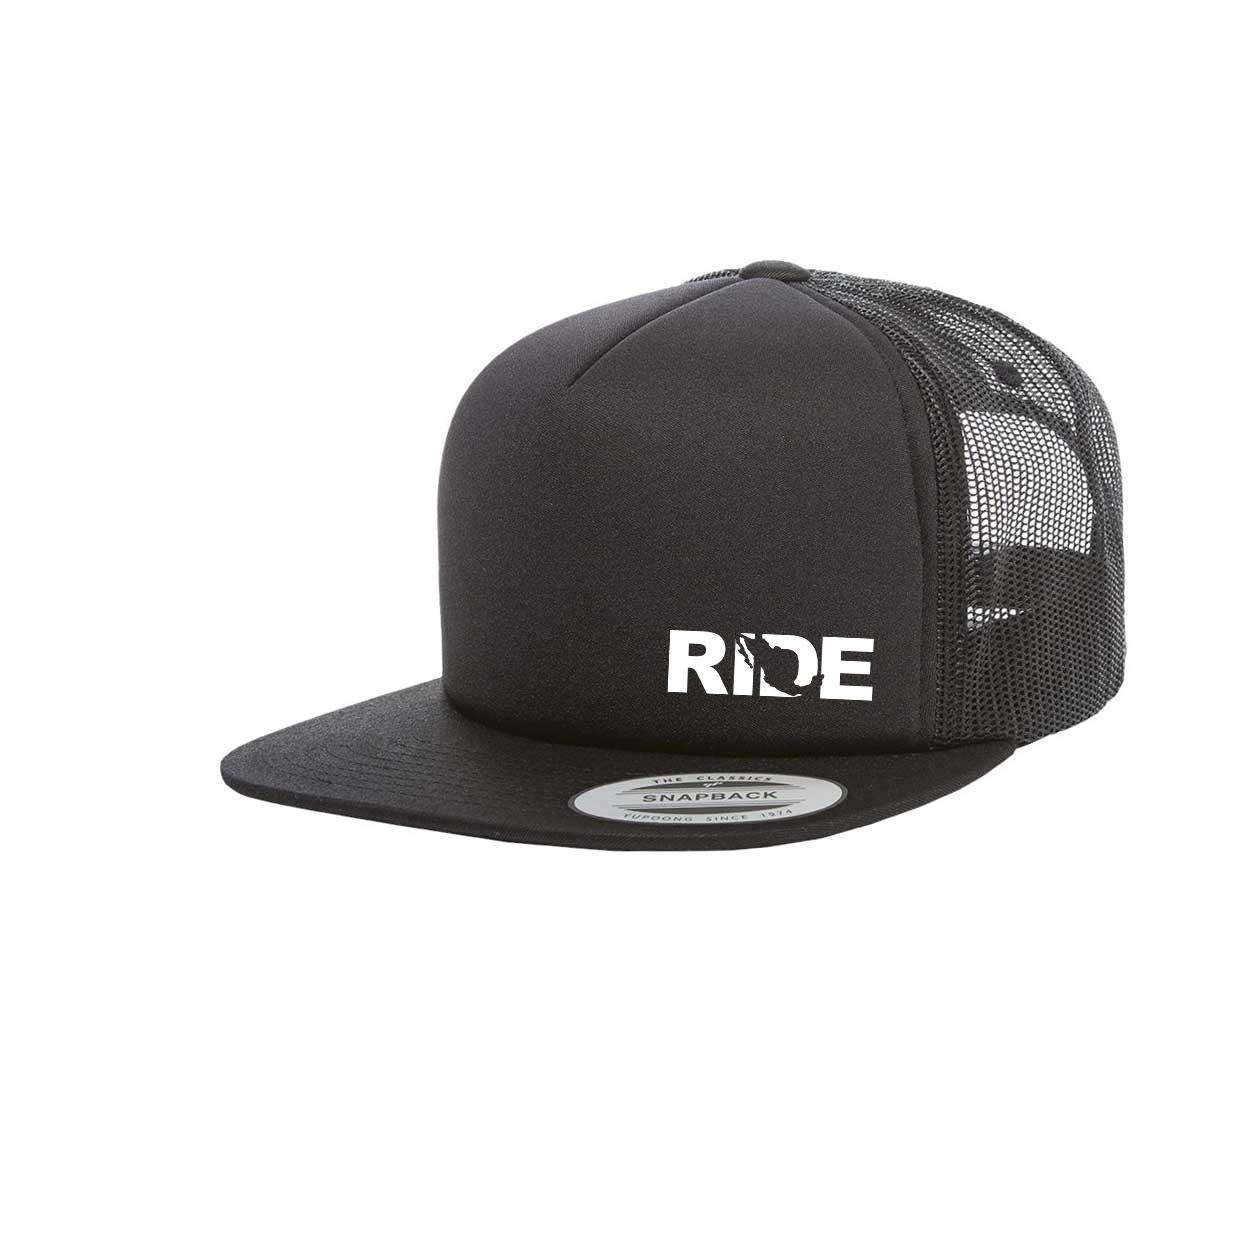 Ride Mexico Night Out Premium Foam Flat Brim Snapback Hat Black (White Logo)